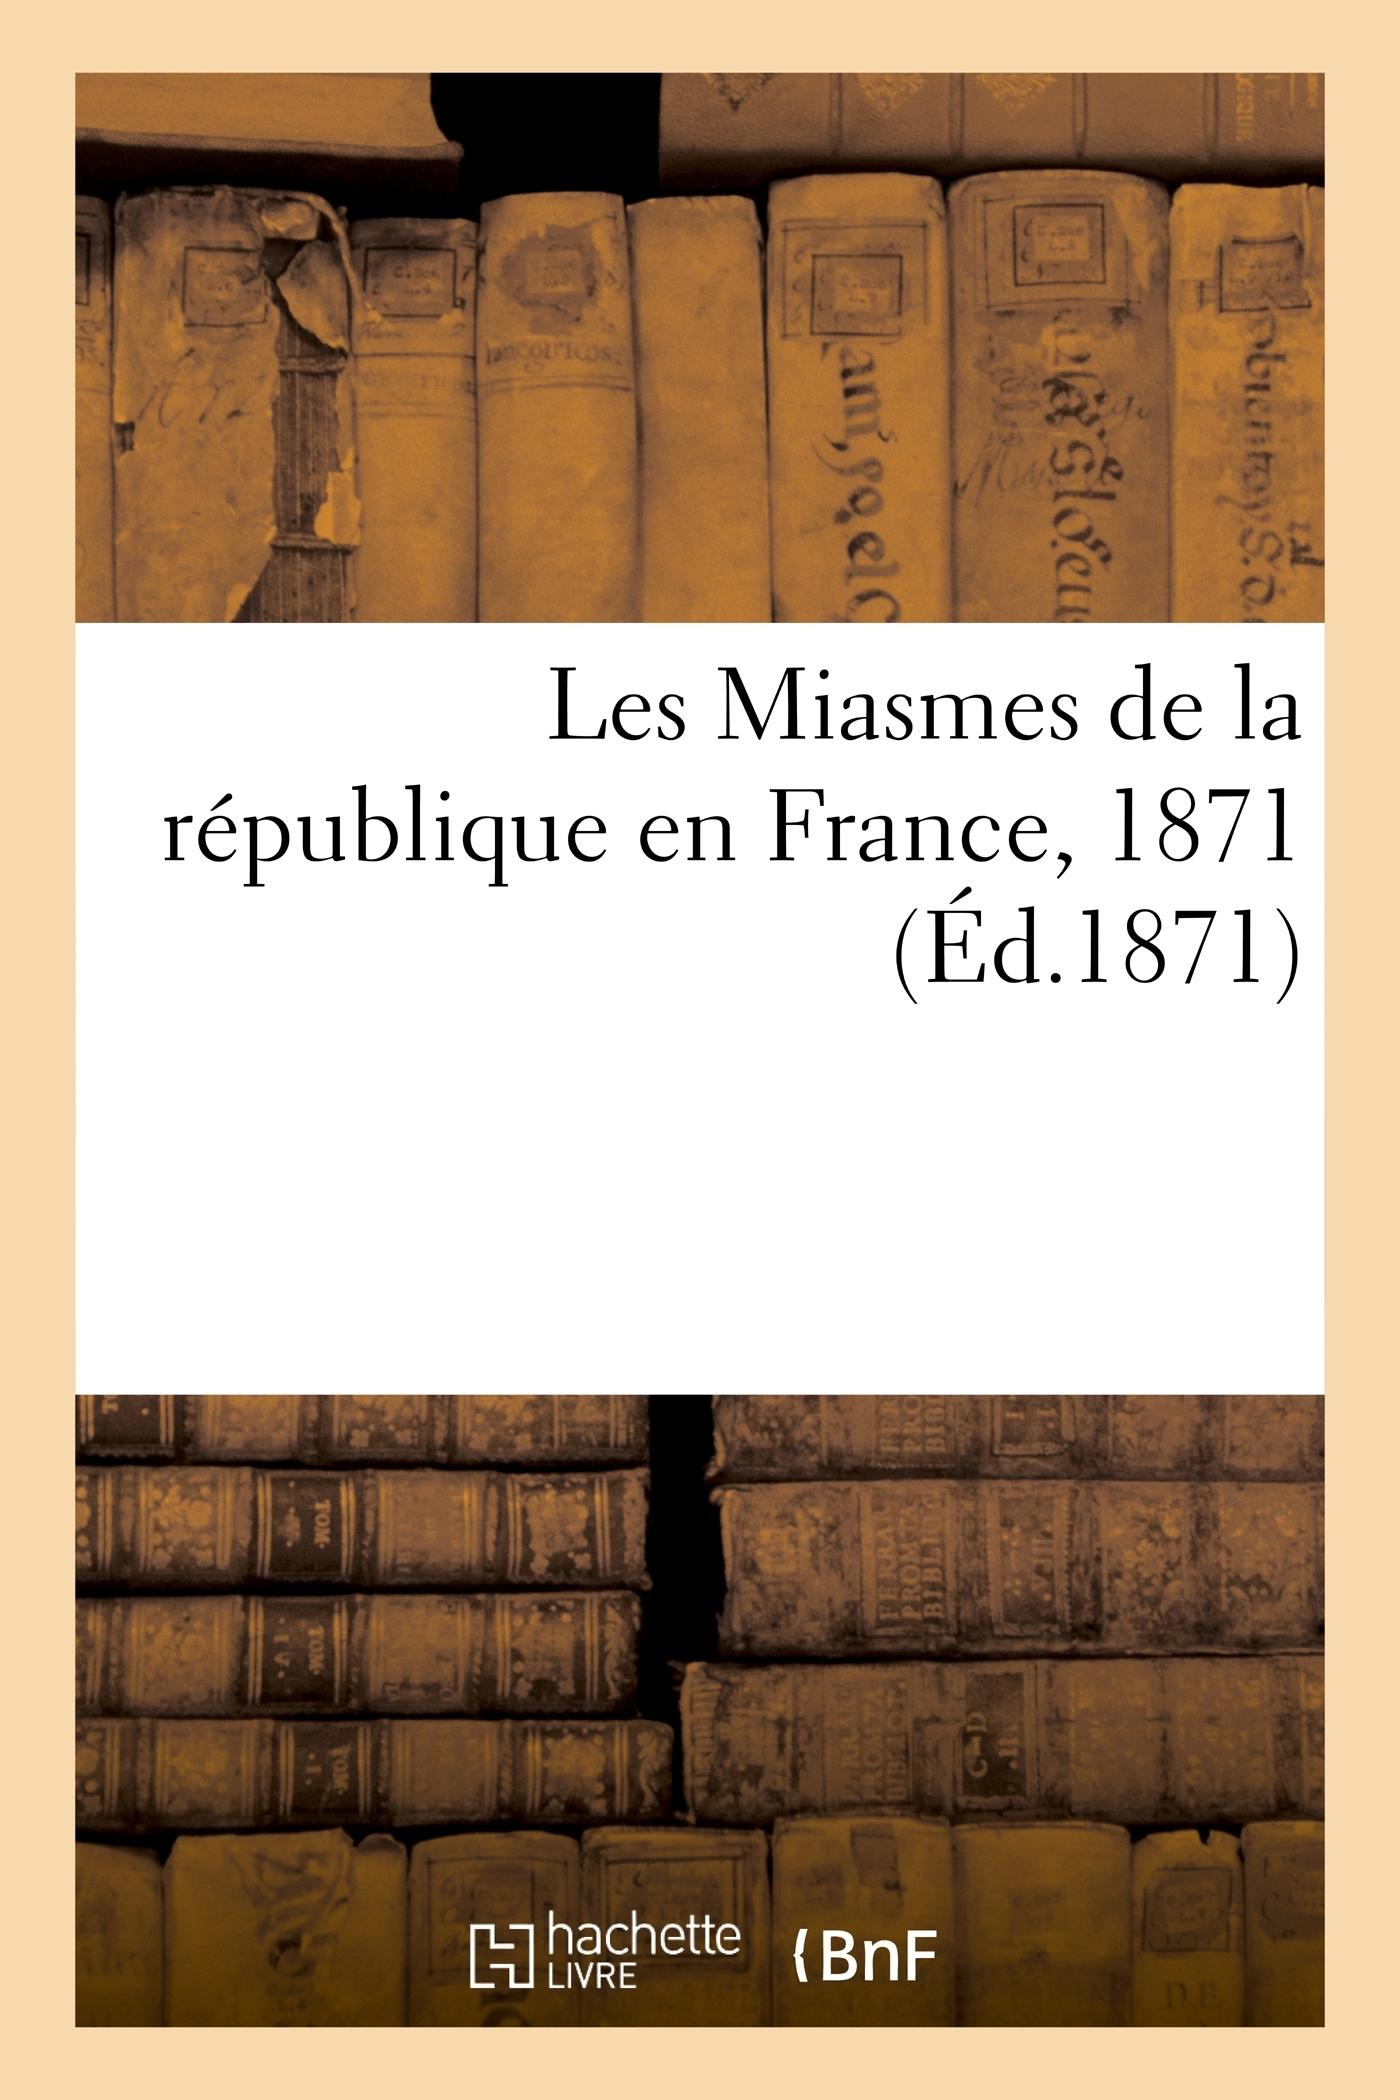 LES MIASMES DE LA REPUBLIQUE EN FRANCE, 1871